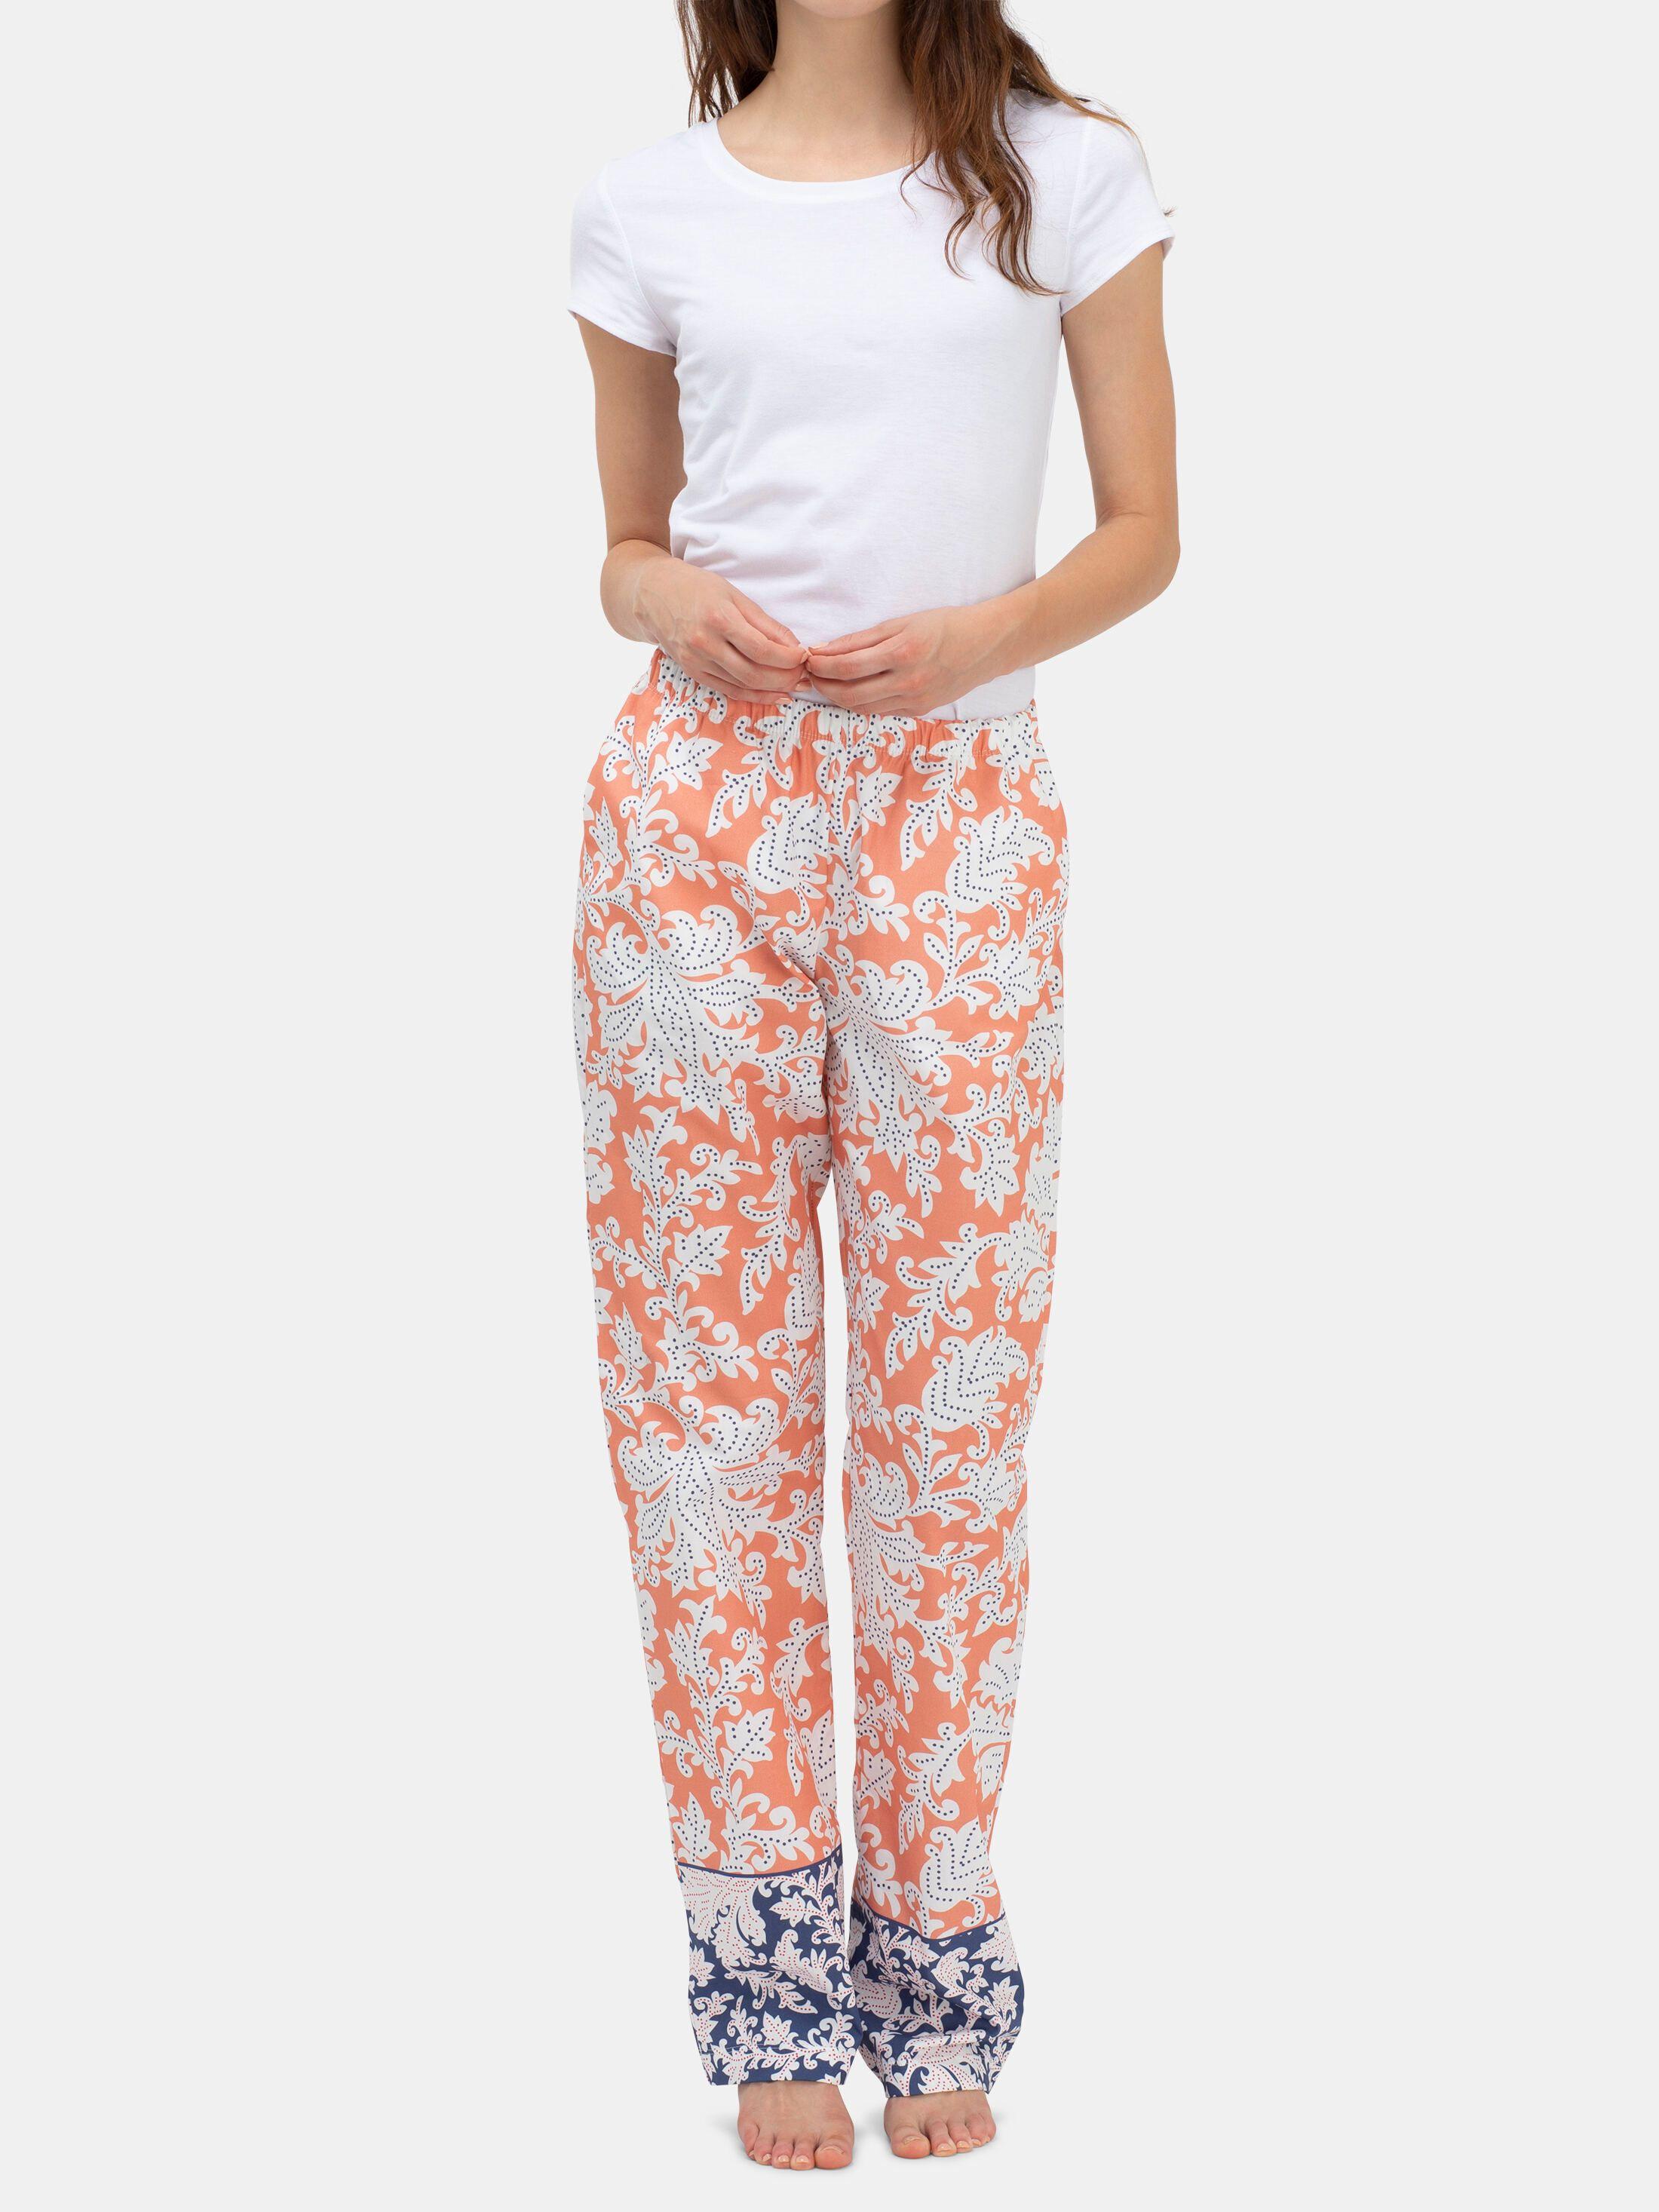 design your own pyjama bottoms